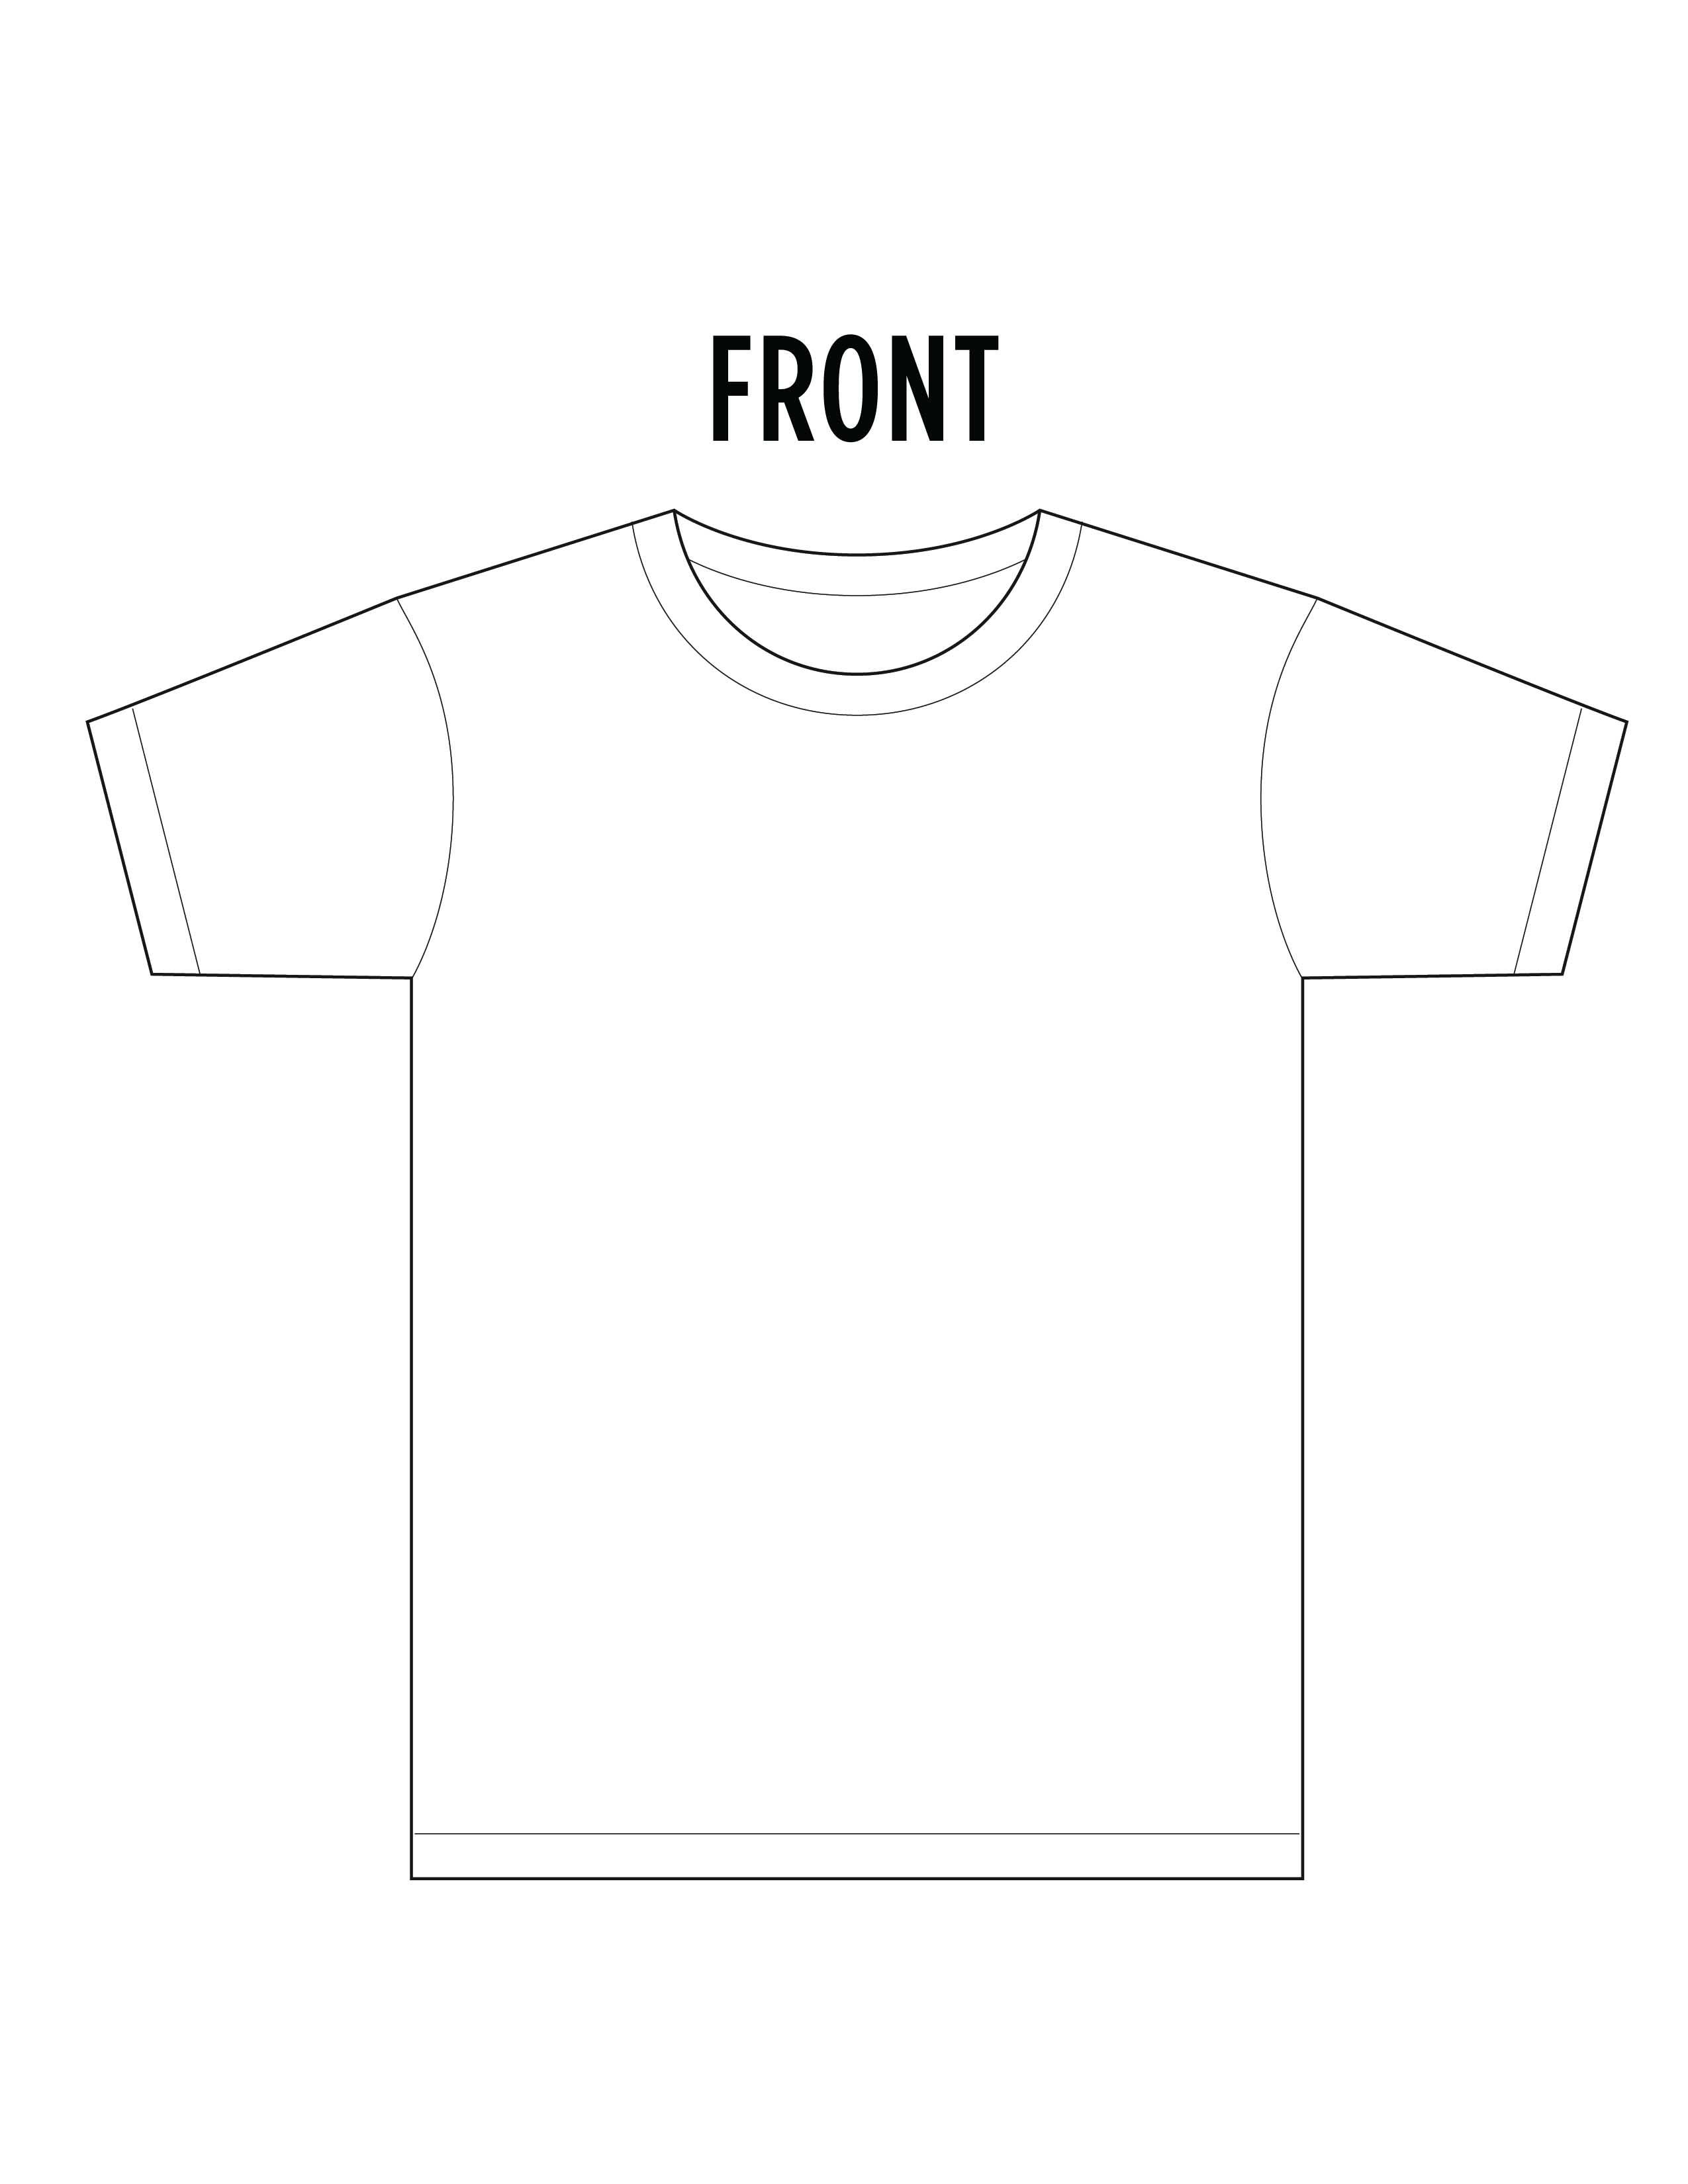 Custom t shirts template photoshop anlis custom t shirts template photoshop maxwellsz